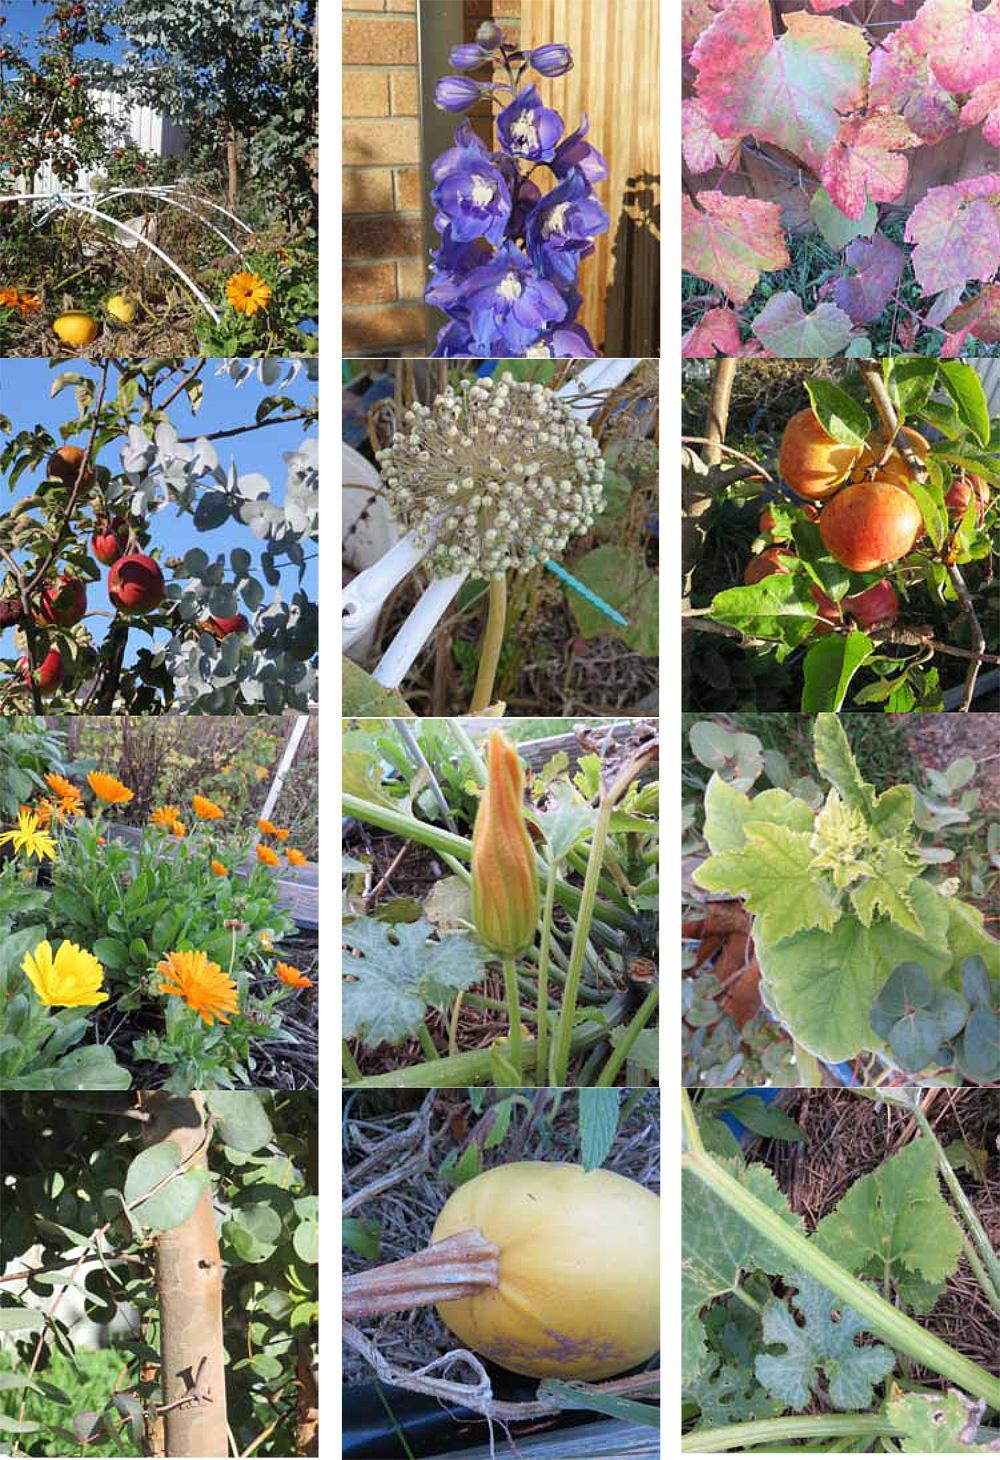 Autumn Garden 2019 - image 1 - student project